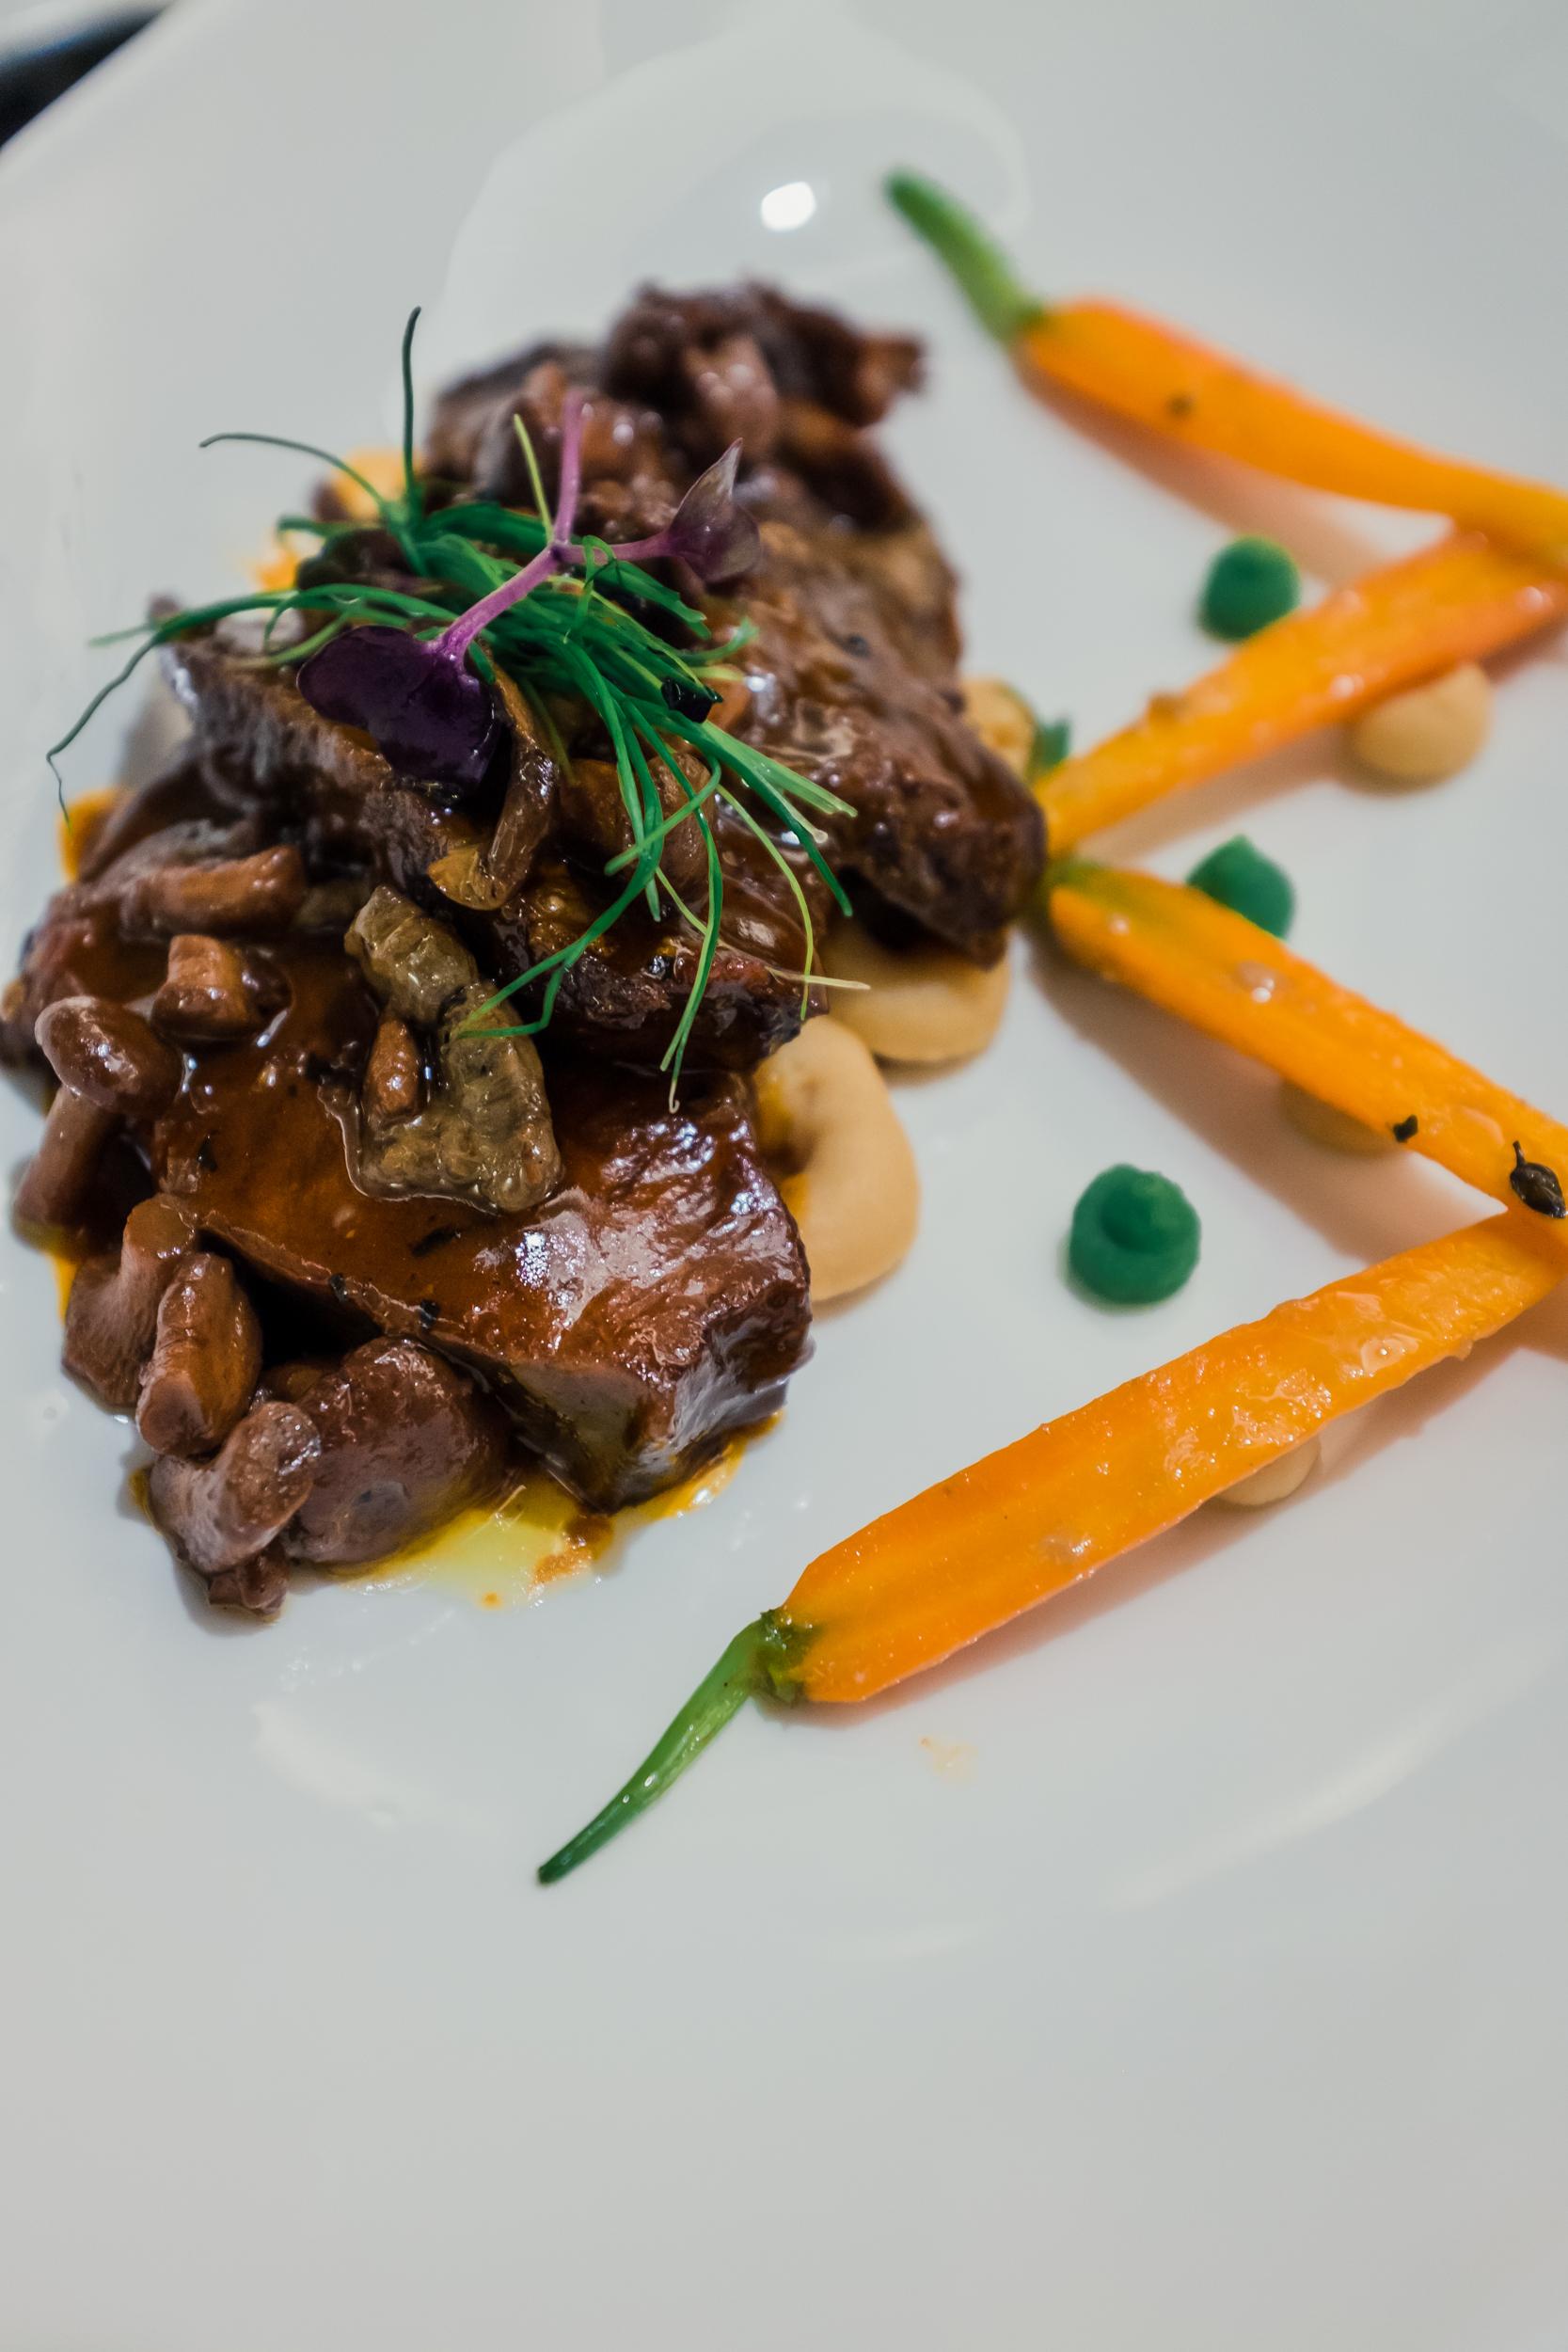 Slow Braised Wagyu Beef Cheek With Creamy Mash, Chanterelle Mushrooms and Veggies